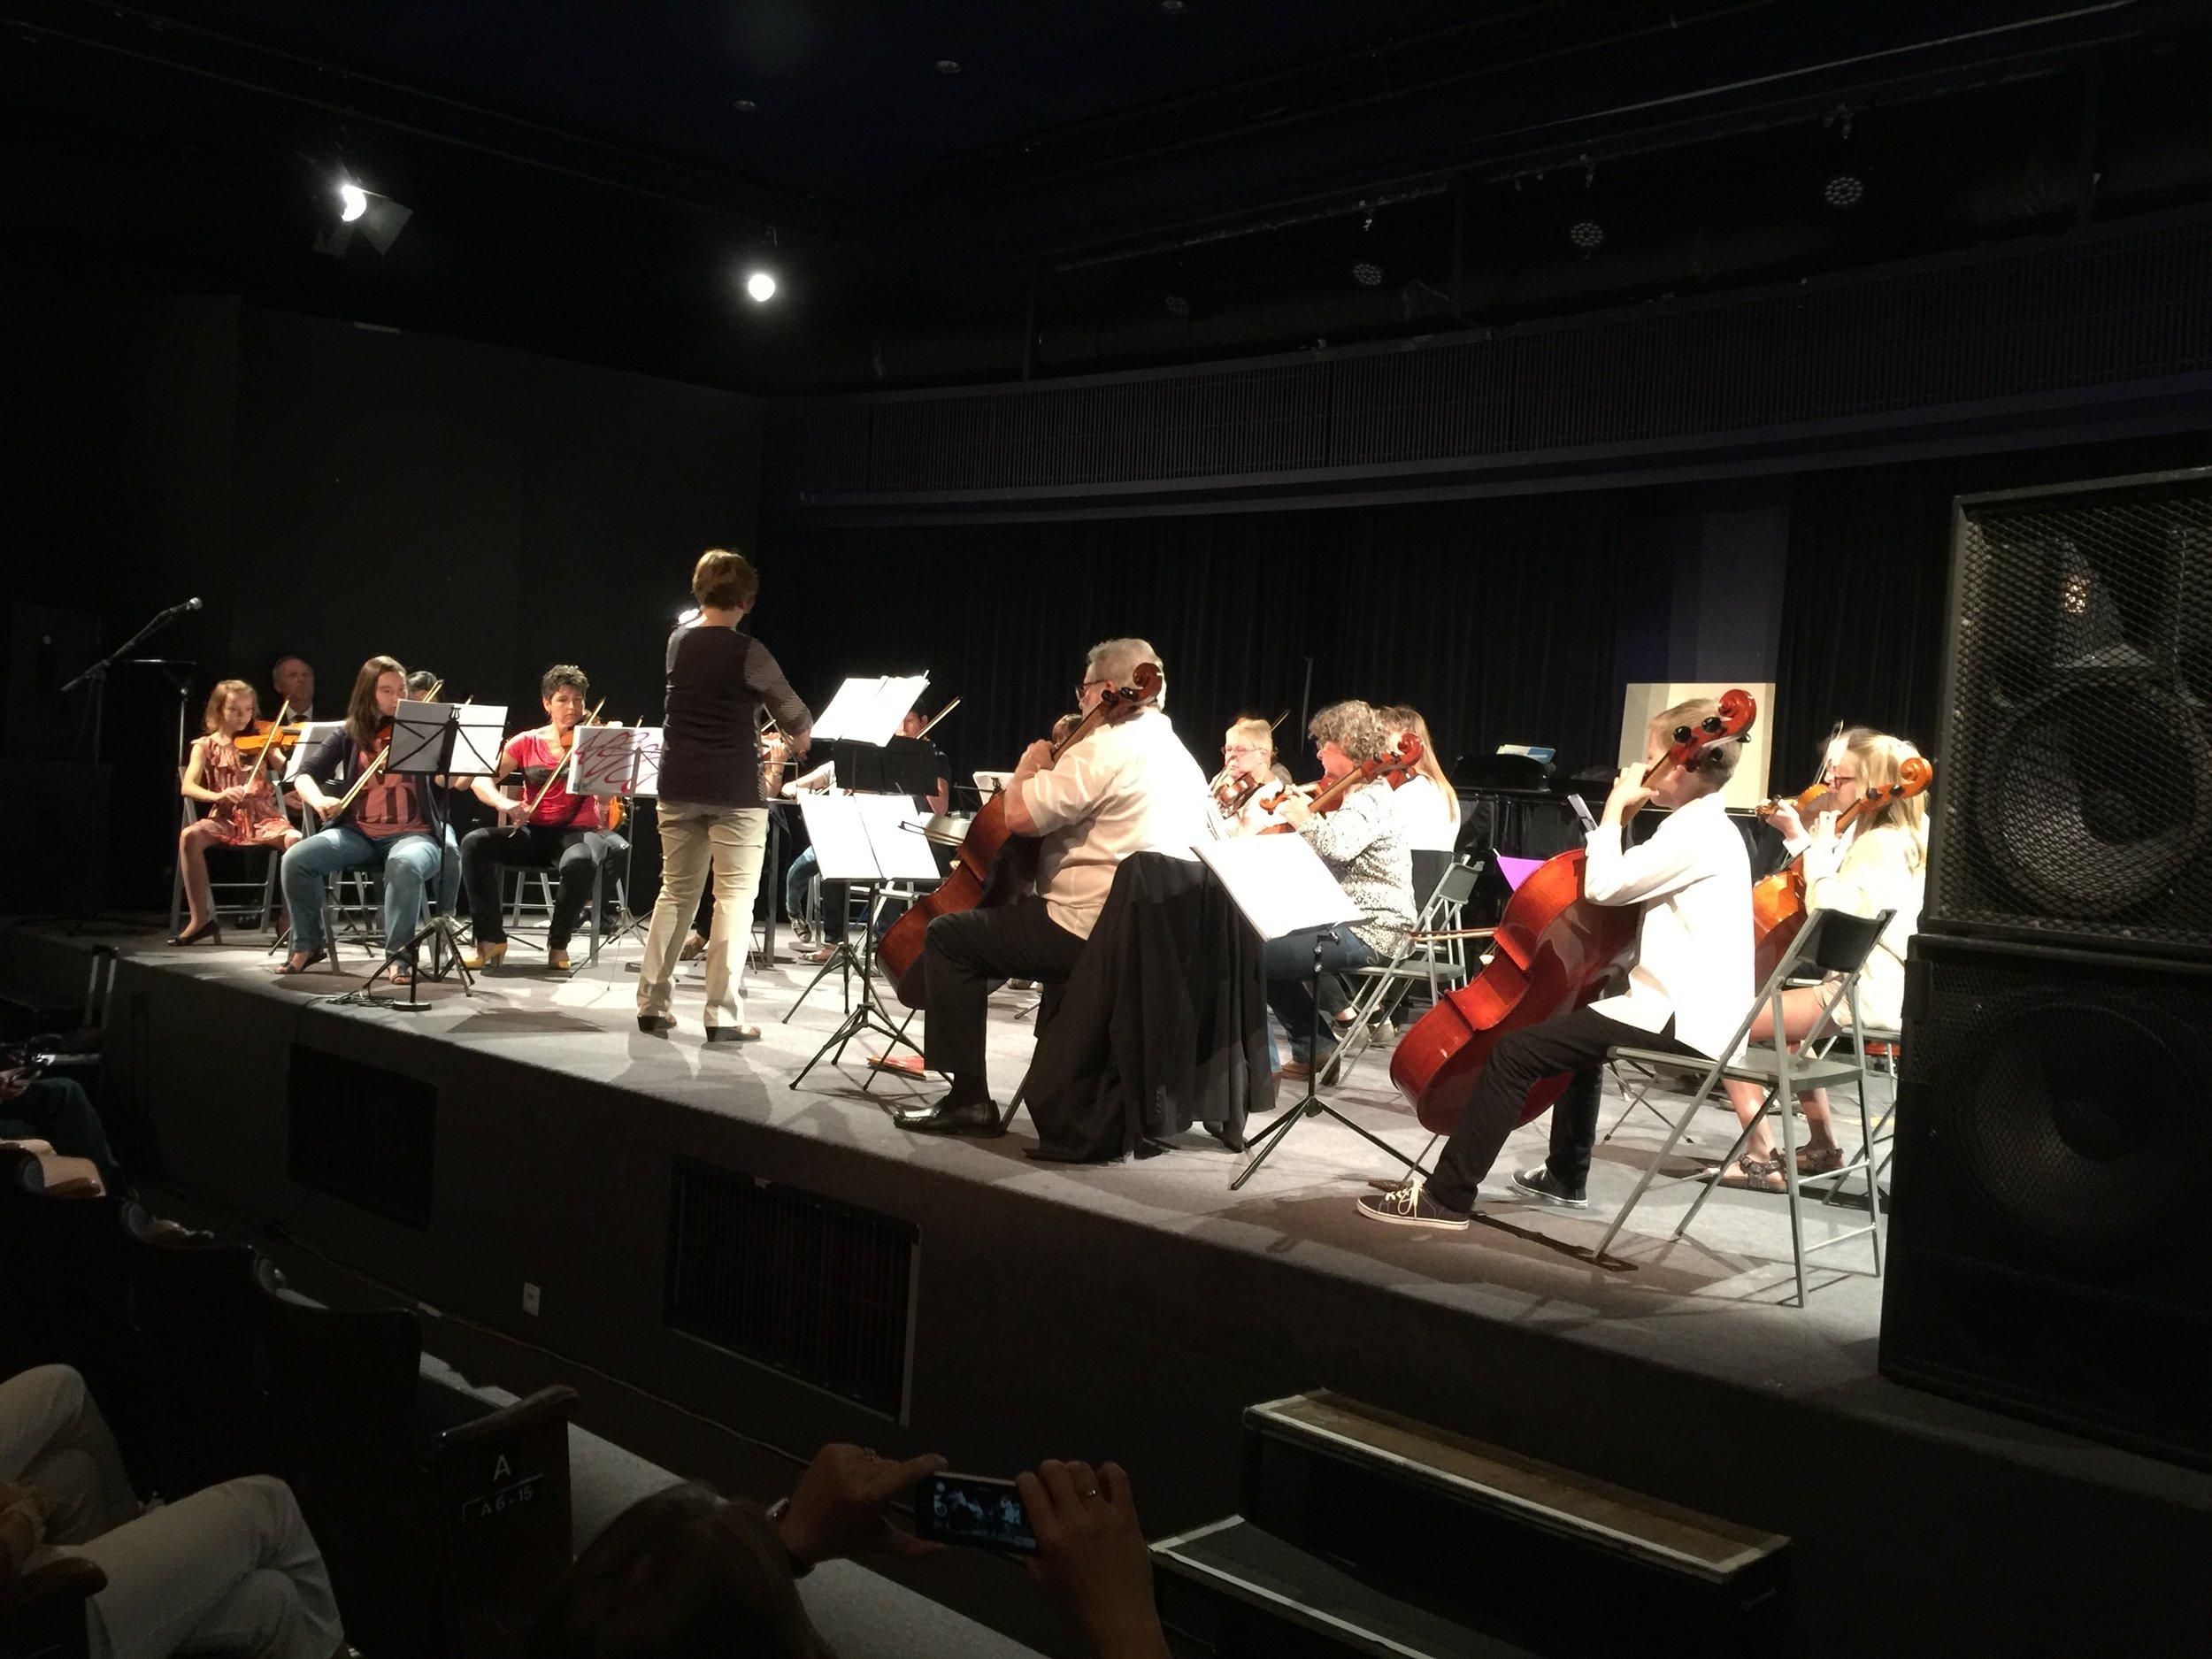 Orkestklas Anna Preszlawska - Dag van de Muziekschool 26 juni 2016 Auditorium Stedelijk Conservatorium Mechelen